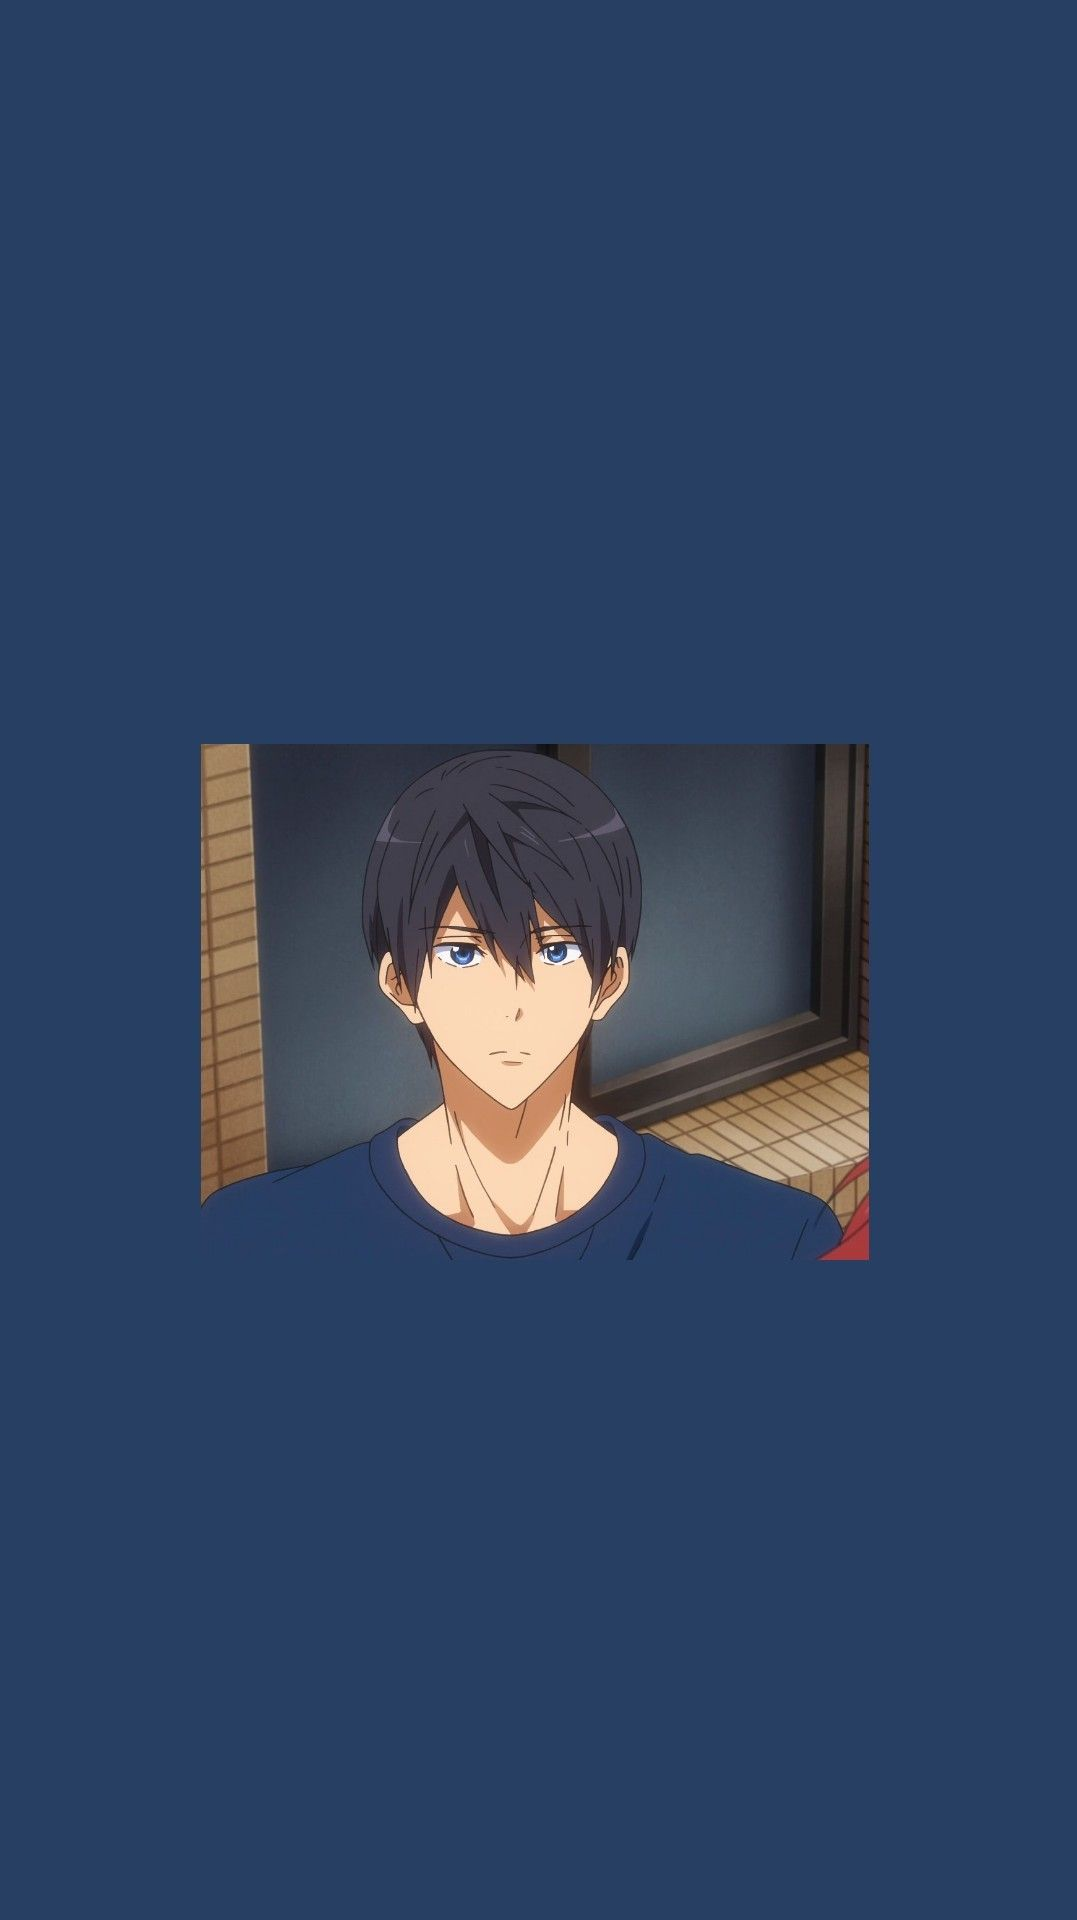 Lemonmxlk Free Iwatobi Swim Club Wallpaper Lockscreen Like In 2021 Free Anime Cute Anime Wallpaper Anime Wallpaper Iphone Free iwatobi anime wallpaper